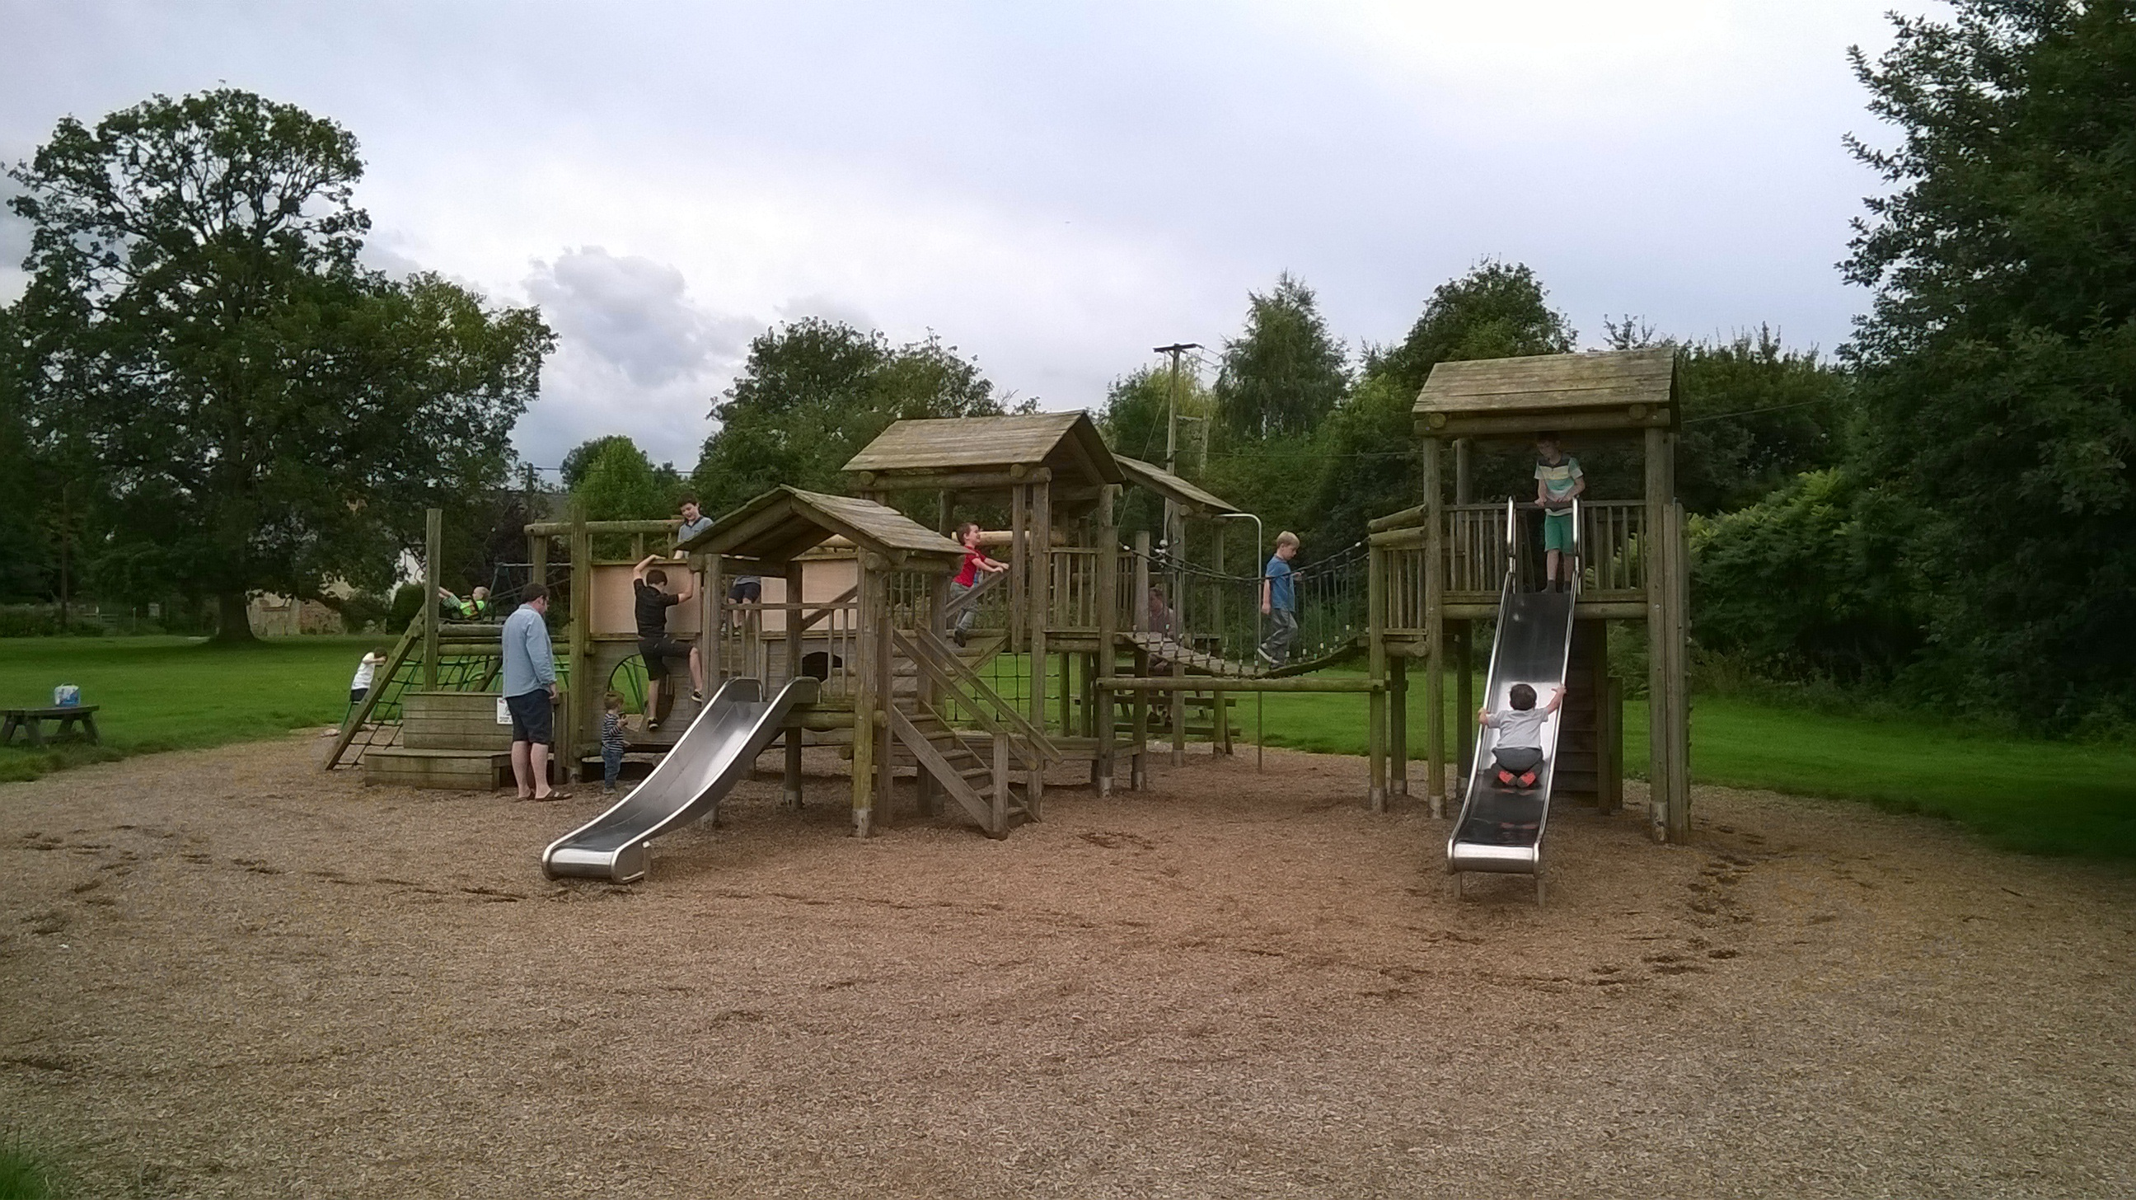 Stadhampton Recreation Ground Play Area